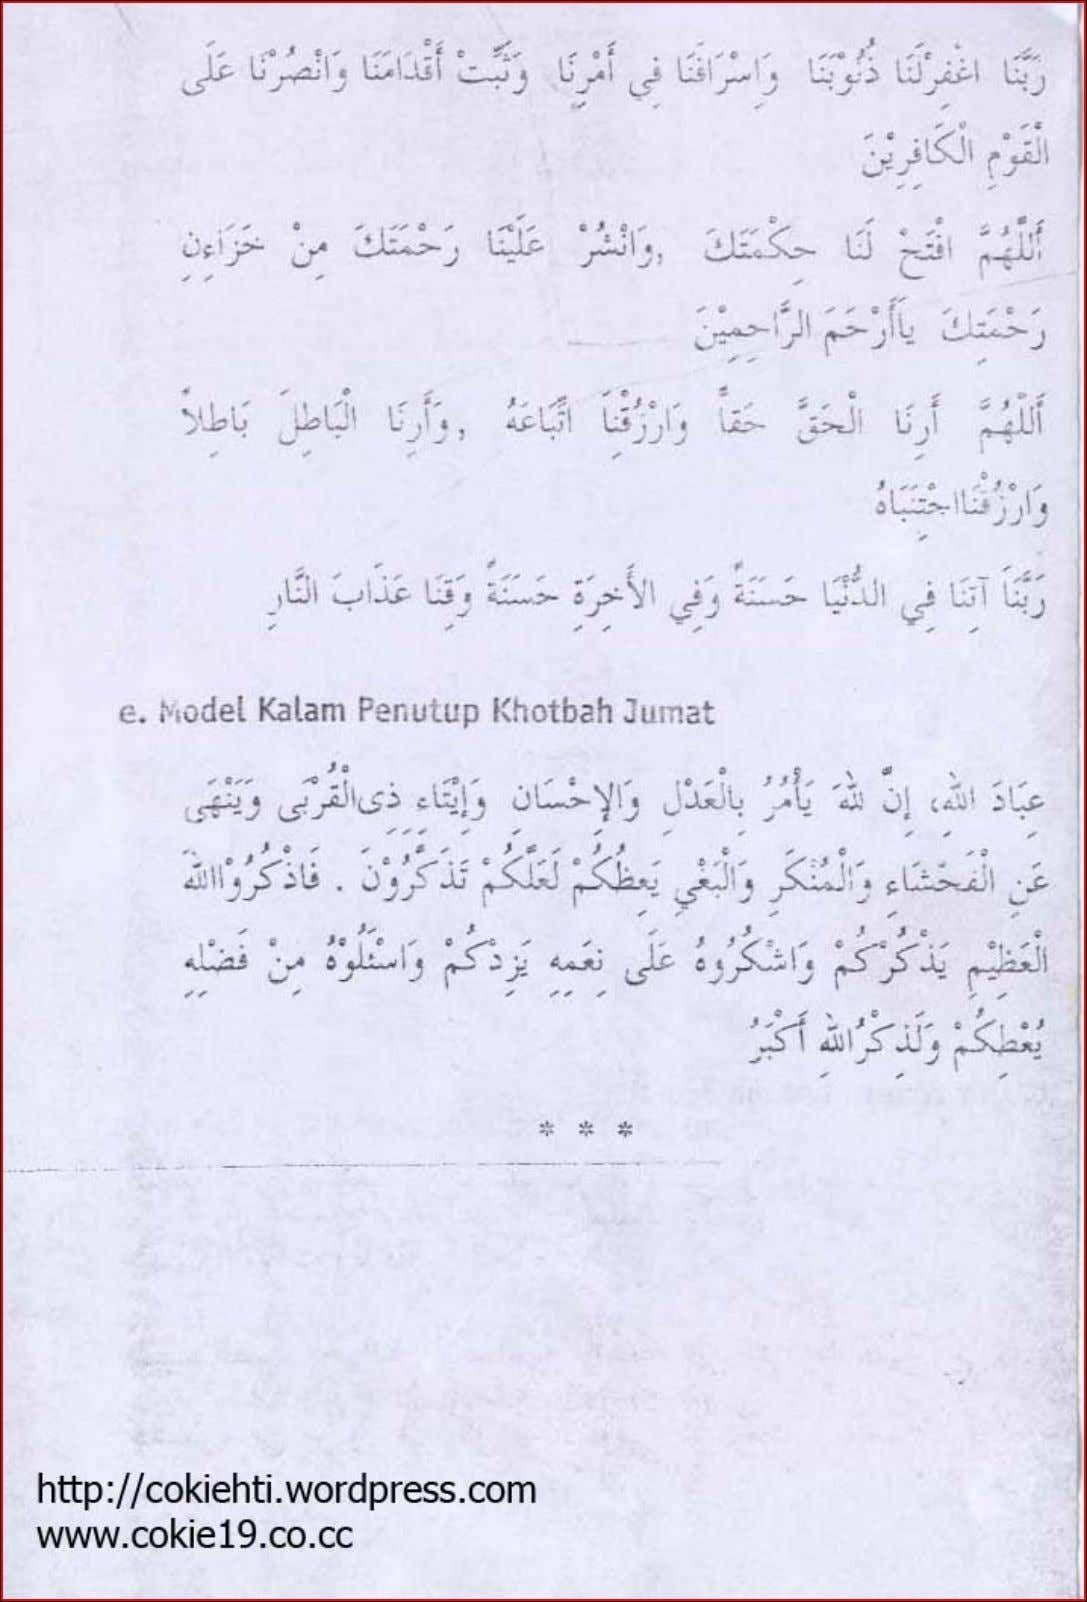 Bacaan Khutbah Jum'at ( Tulisan Arab ) di 2020 Tulisan